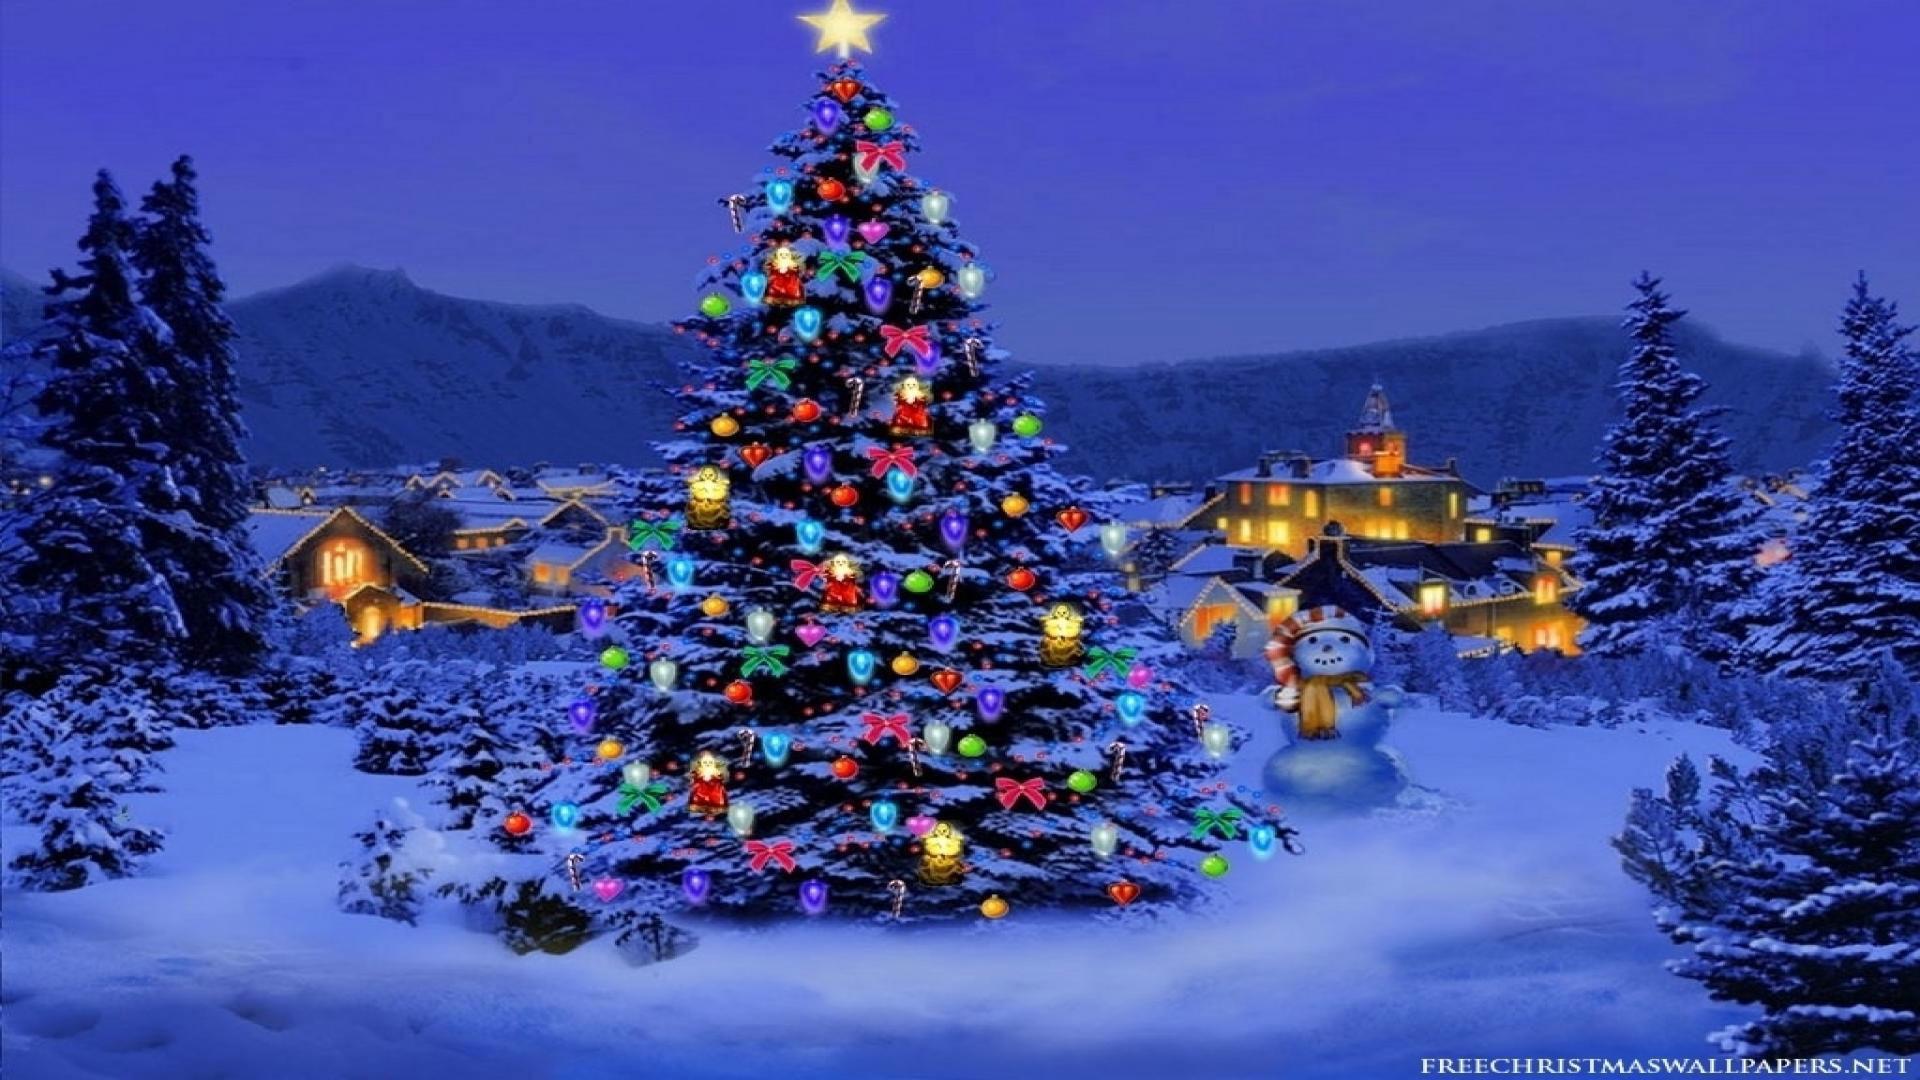 hd pics photos stunning attractive christmas tree 21 hd desktop background  wallpaper